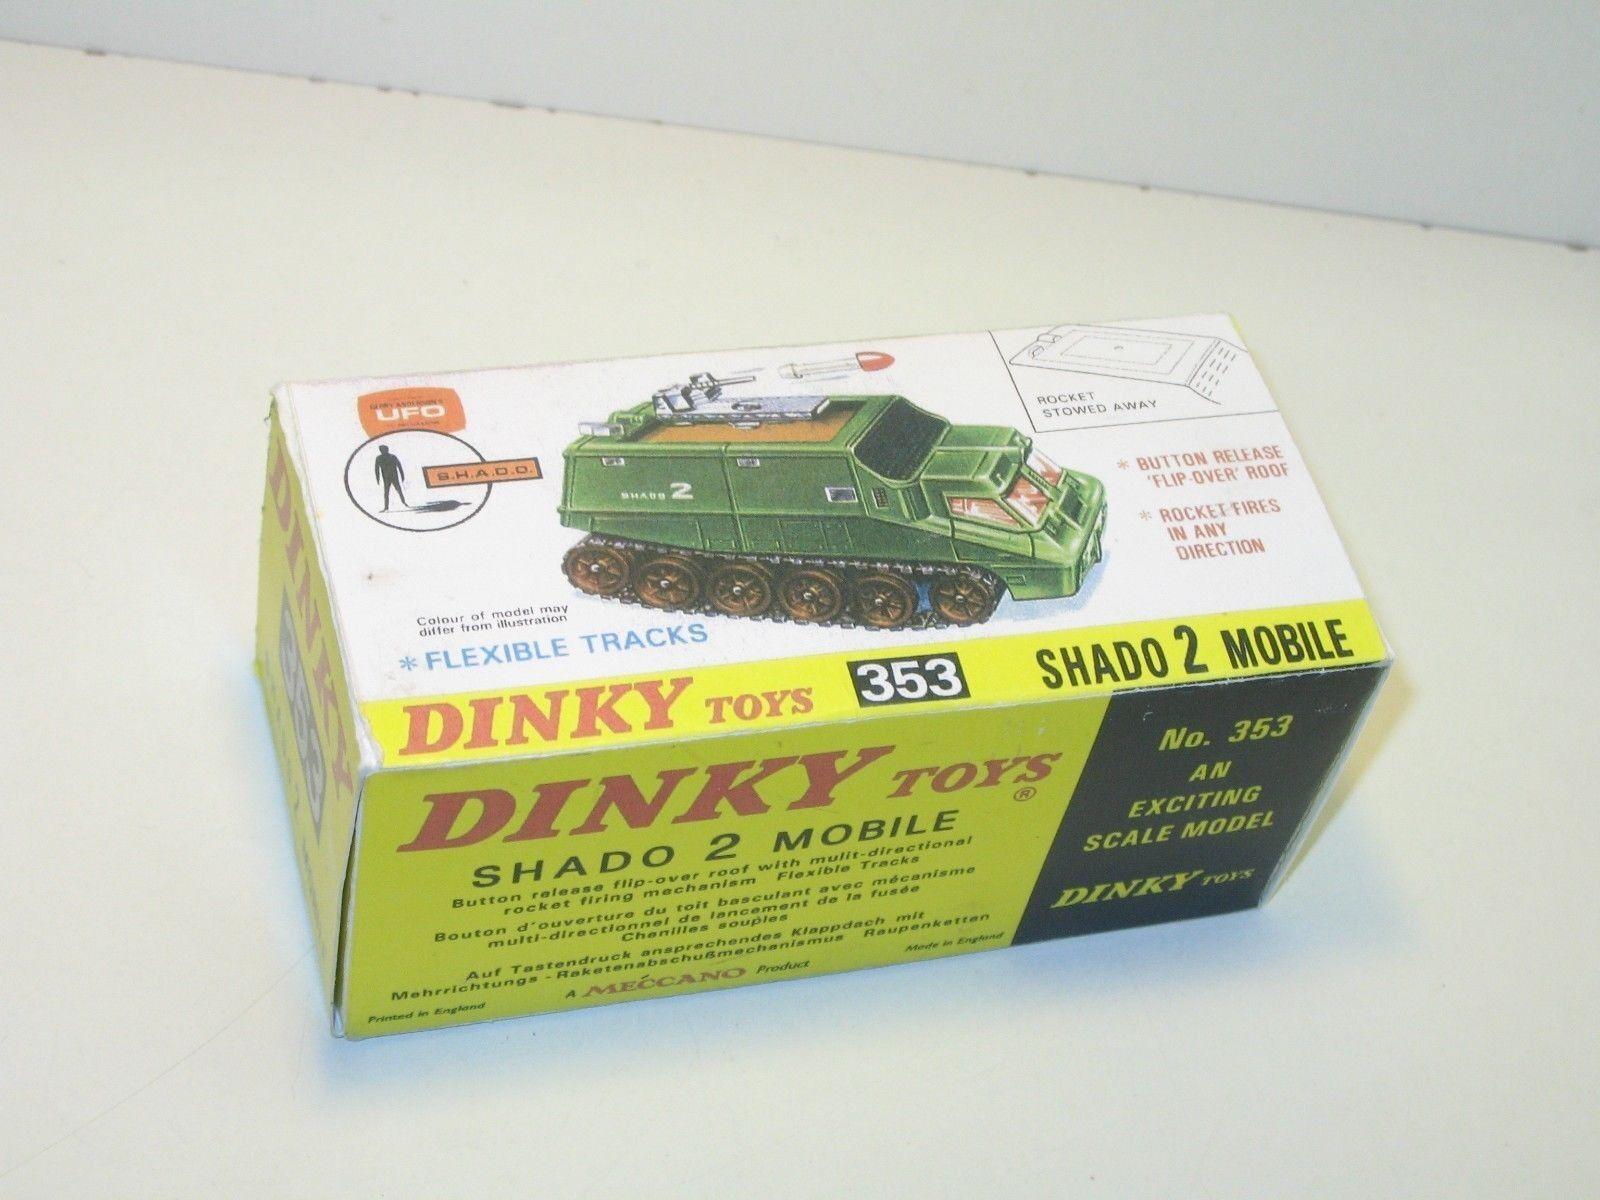 N89, CAJA militar repro, SHADO 2, DINKY toys ref 353